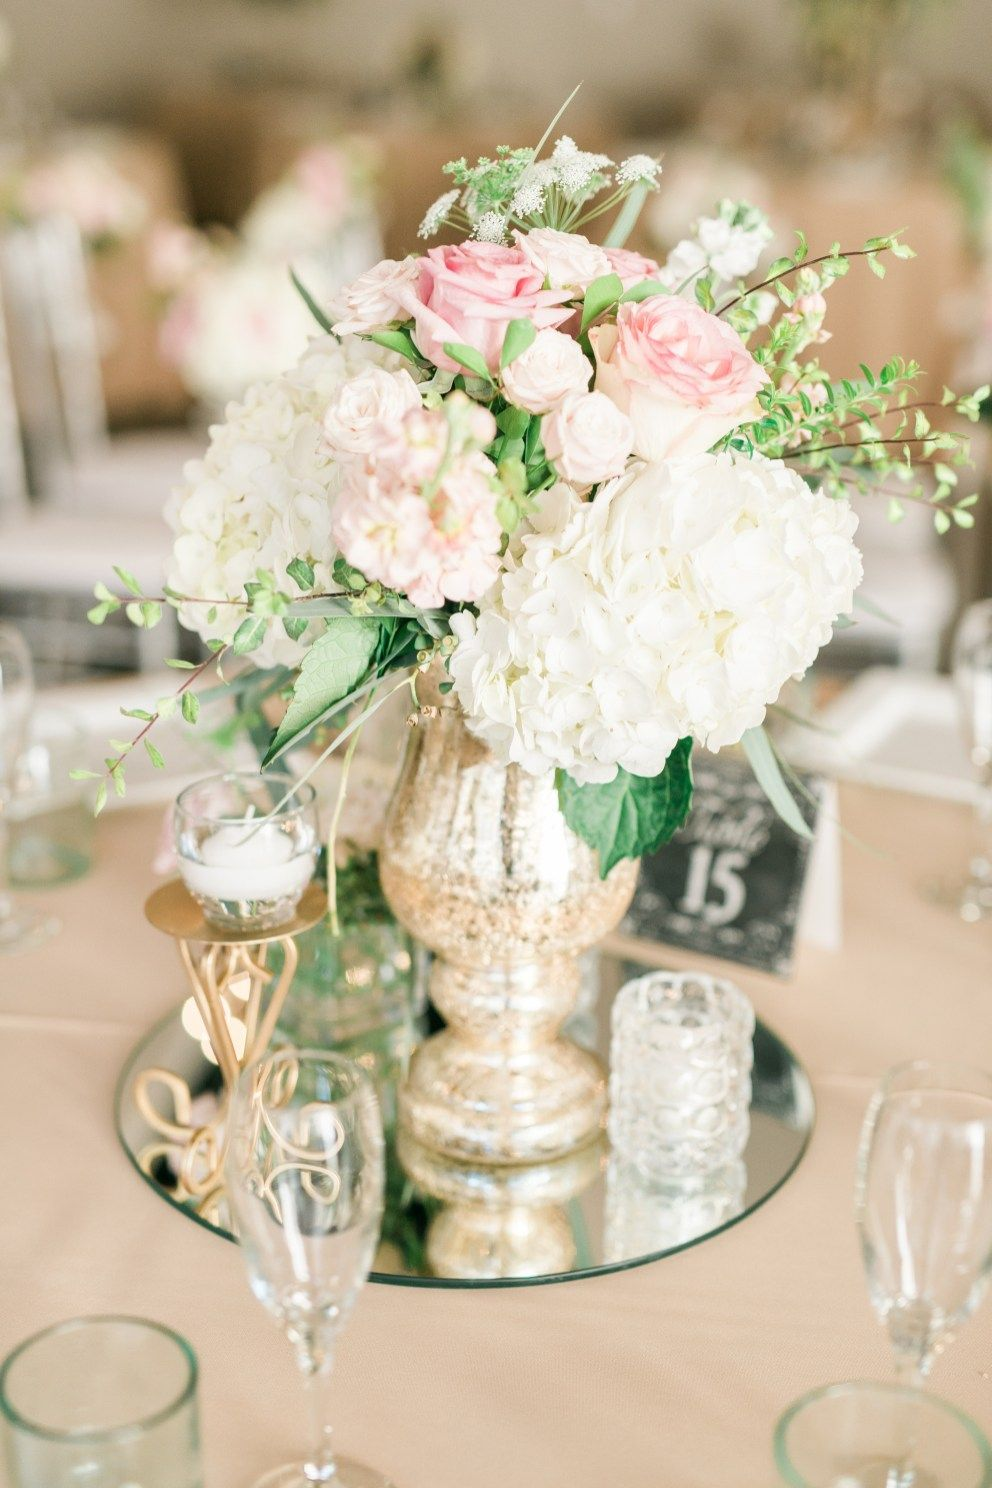 Enchanting Mums Centerpieces Wedding Photo - The Wedding Ideas ...